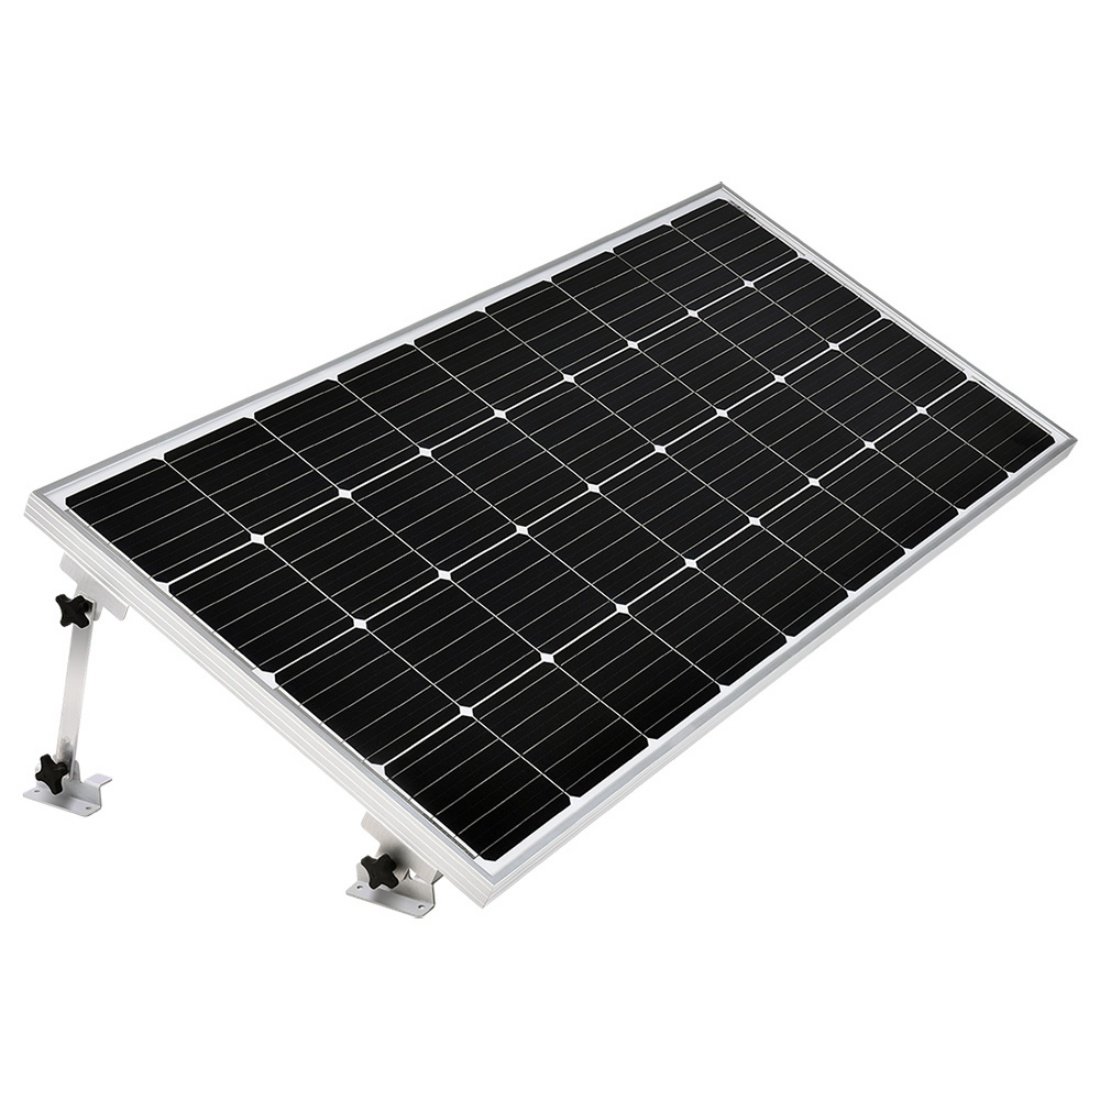 Maxray 170W Caravan Solar Panel Kit Monocrystalline 12V